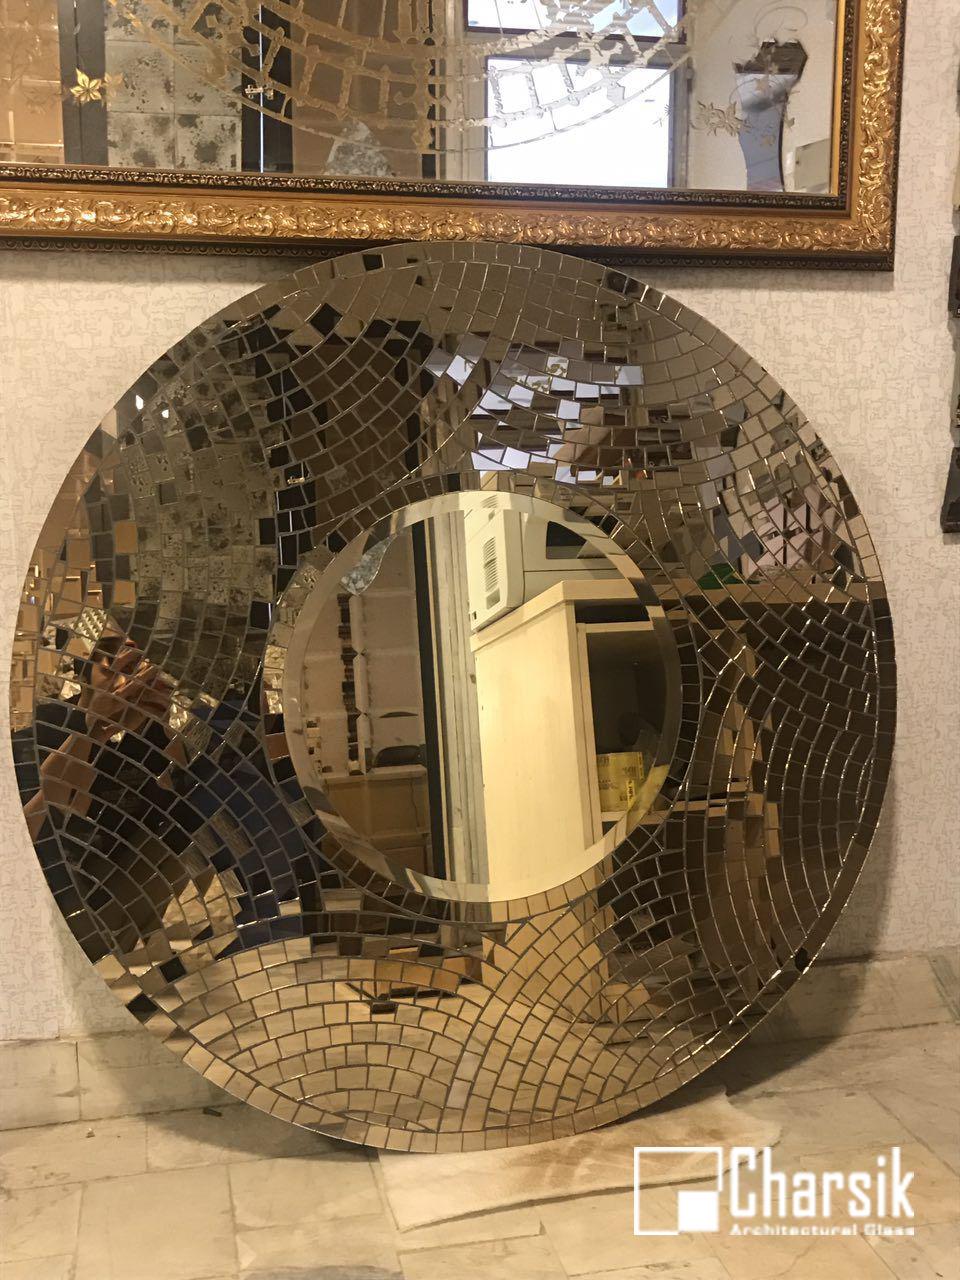 آینه دکوراتیو، طرح خانه بندی چارسیک